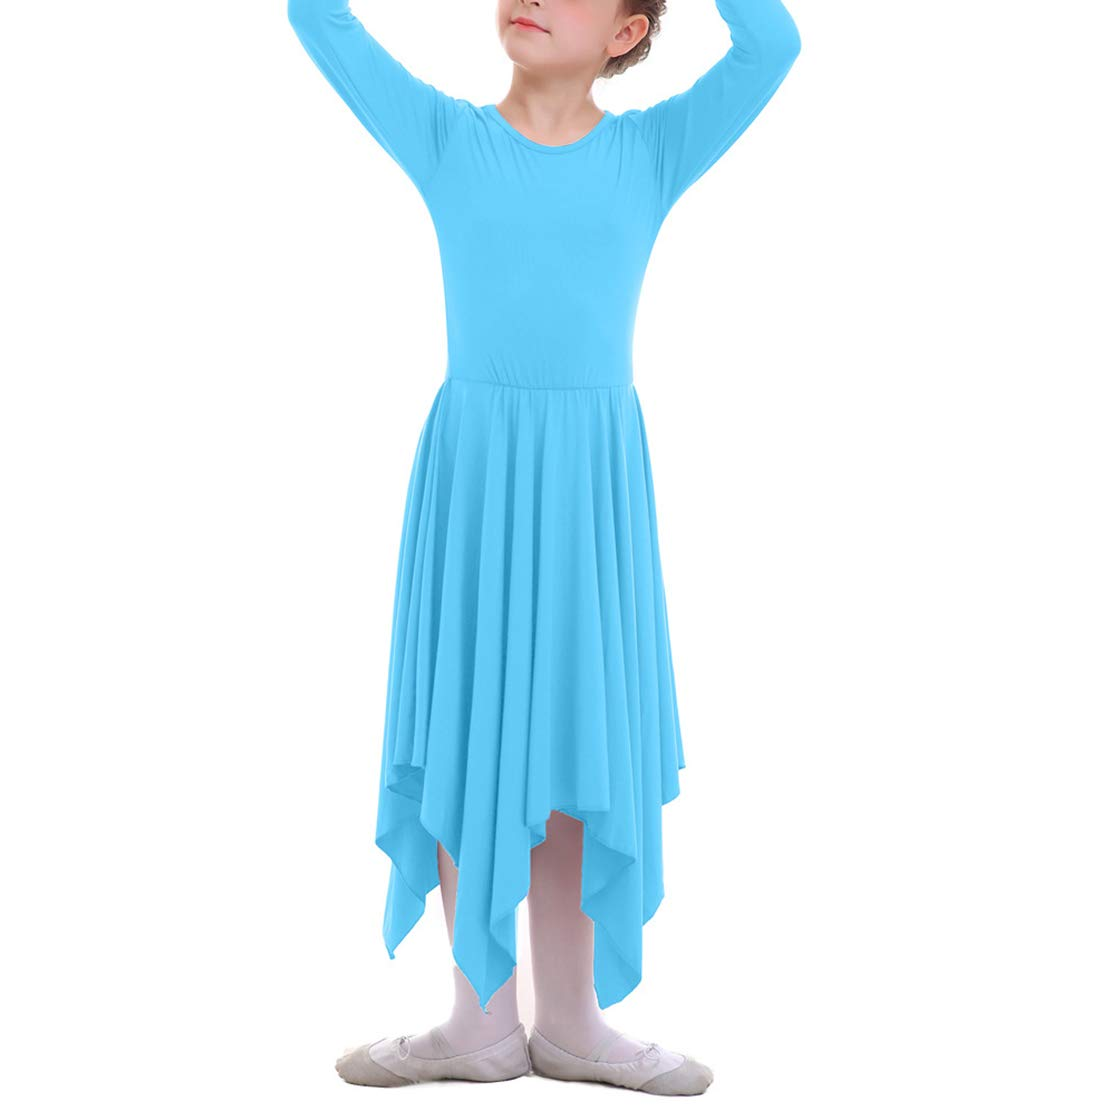 Vestidos Danza Cristiana Maillot Larga para Mujer Ni/ñas Chica Disfraz Bailarina Actuaci/ón Fiesta Manga Larga Lit/úrgico Leotardo Asim/étrico Gimnasia Elegante Ropa